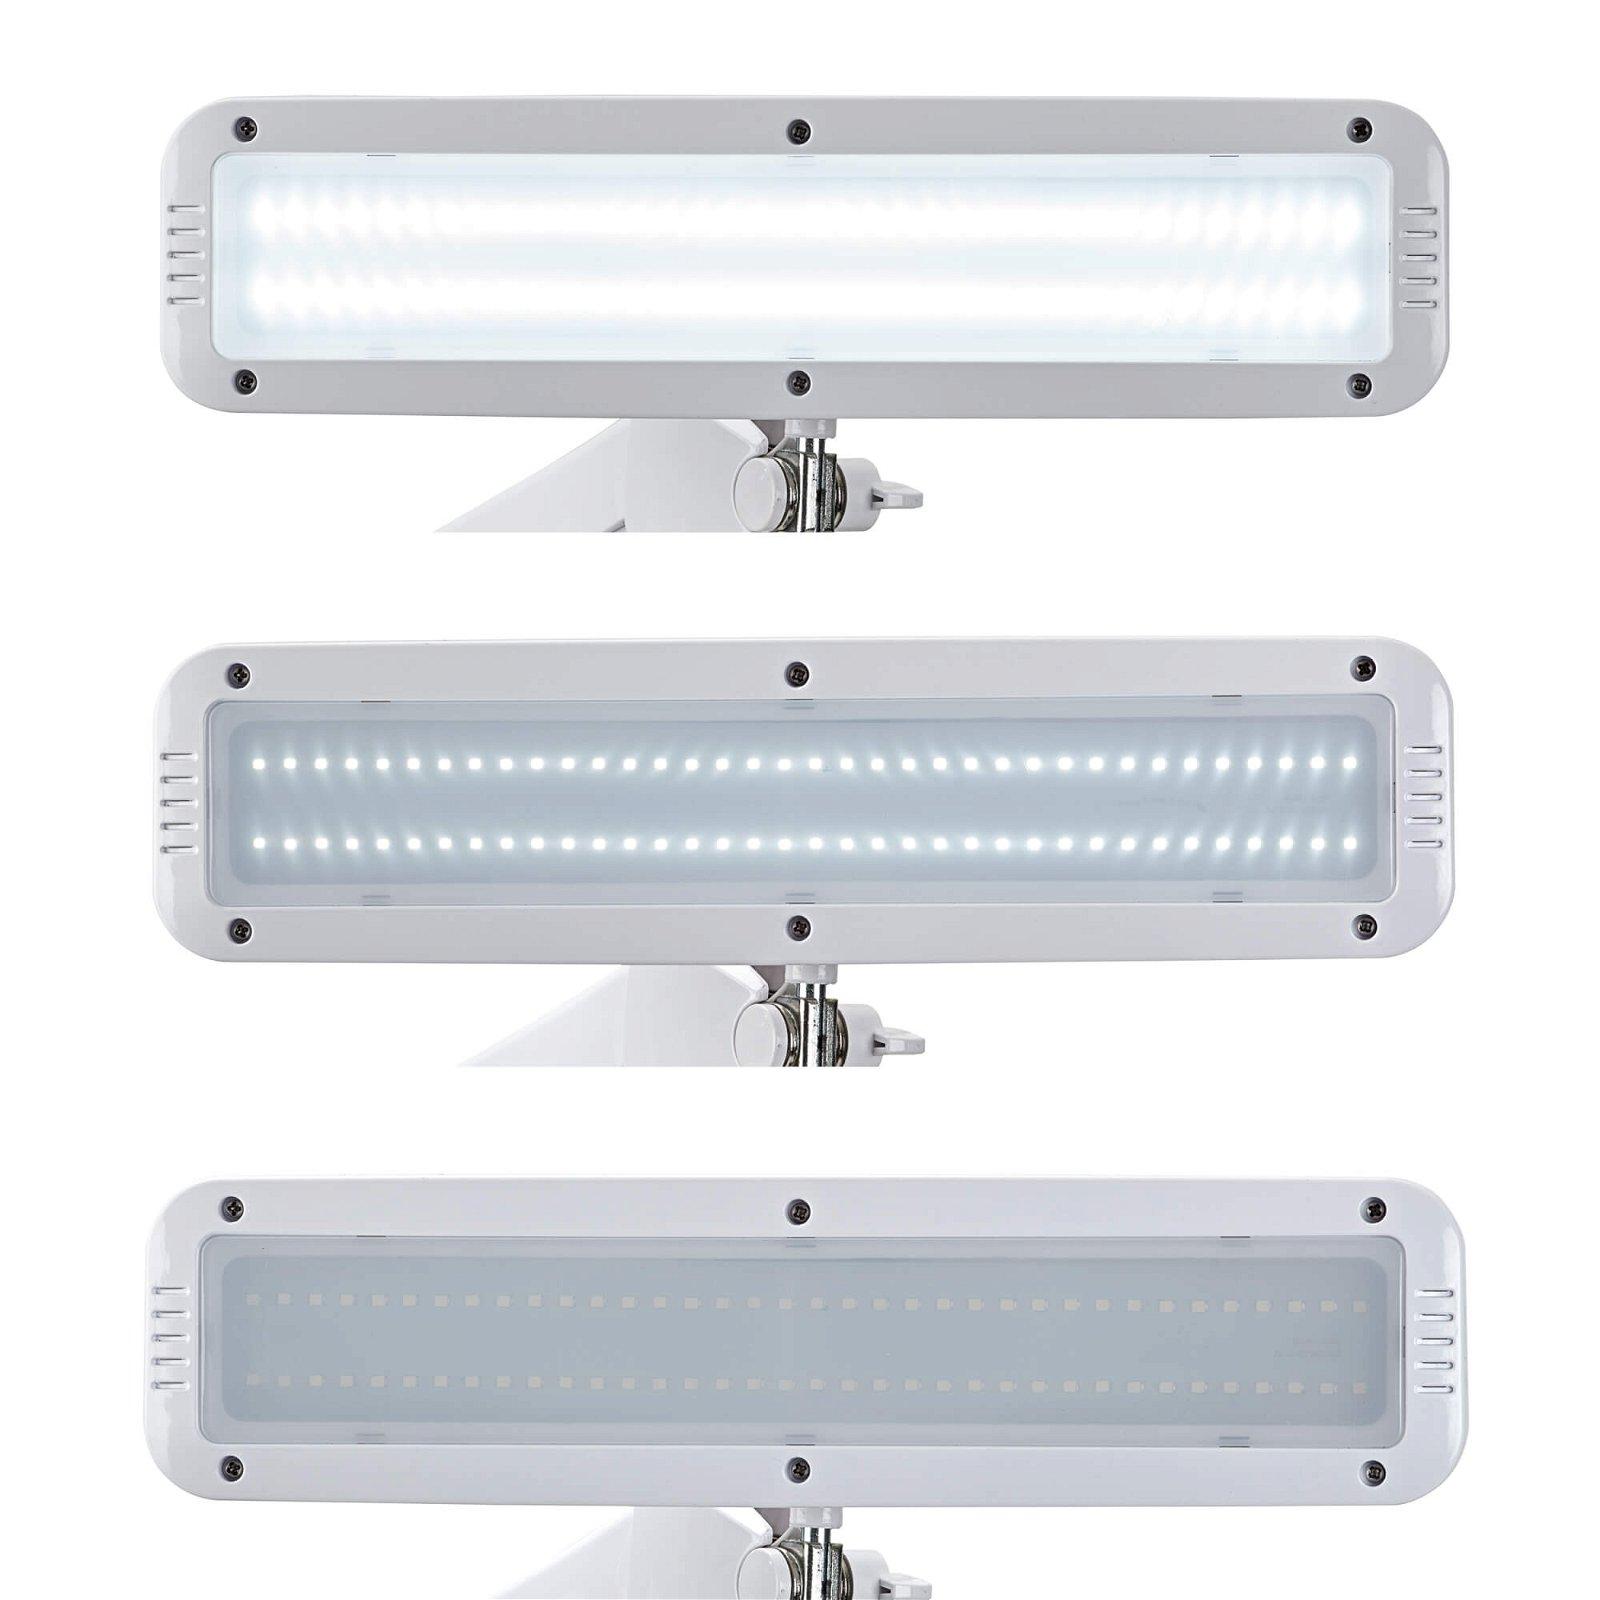 LED-Arbeitsplatzleuchte MAULintro, dimmbar